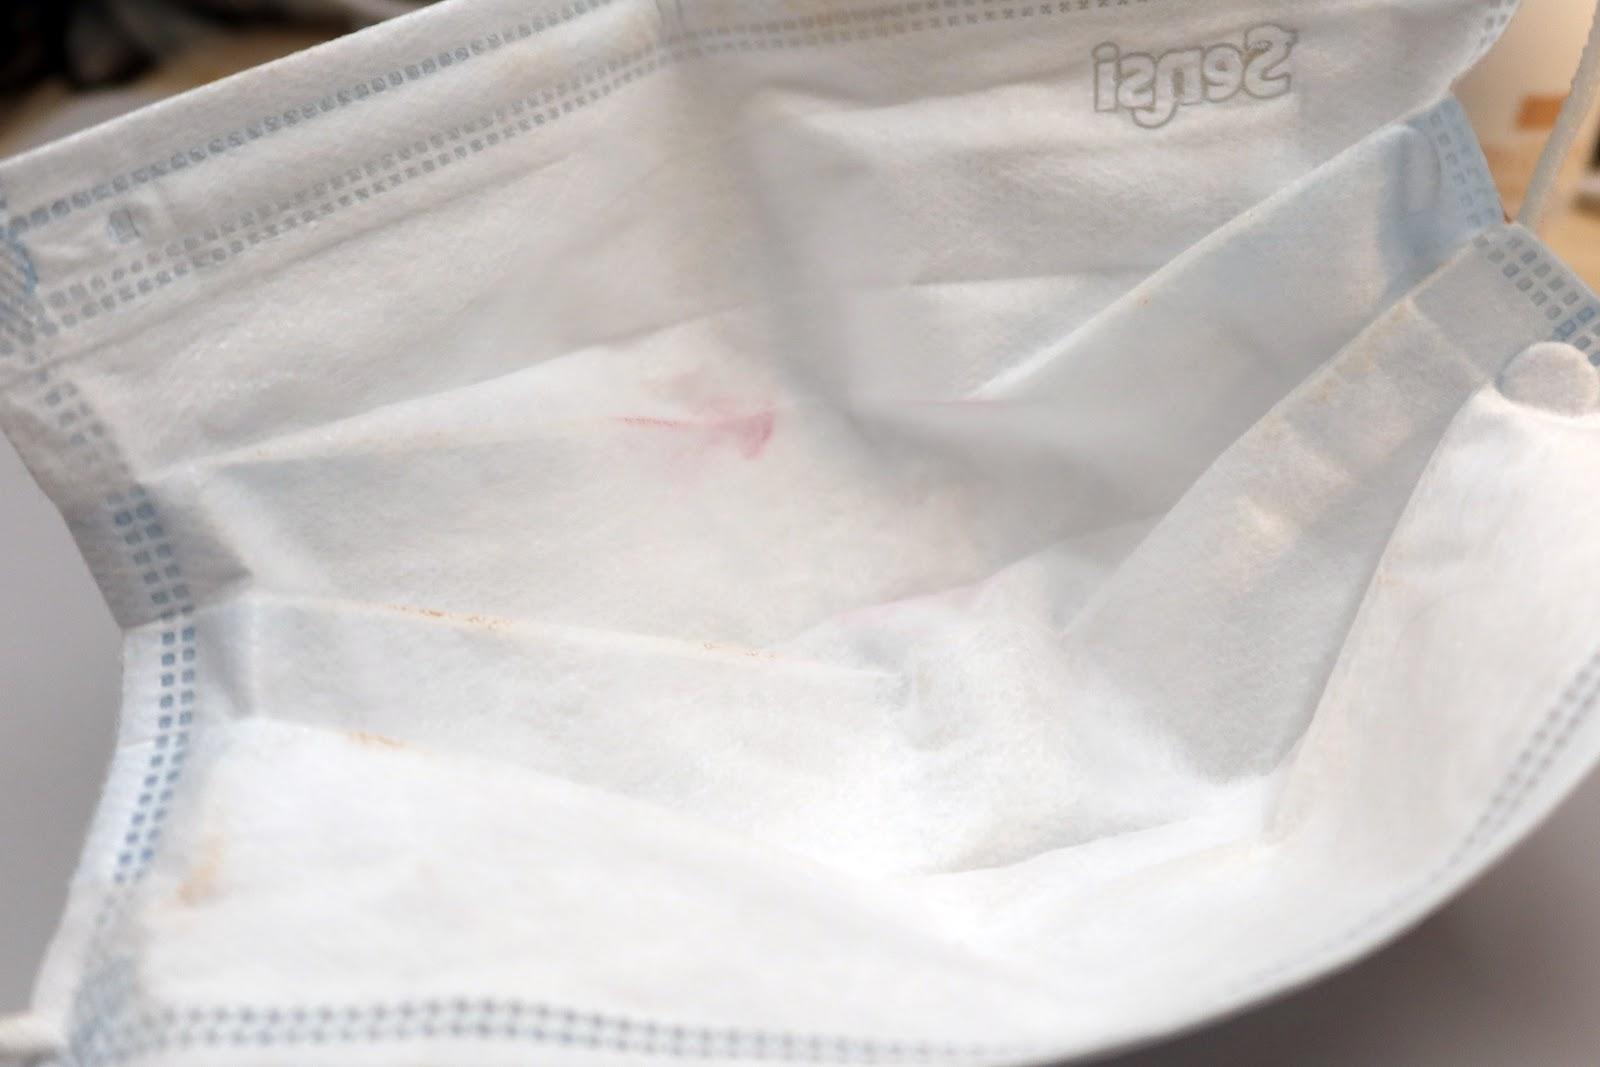 Clarins 粉底 粉底液  iTRIAL 美評 口罩 實測 Clarins Milky Boast 牛奶粉底 實測 用後感 review